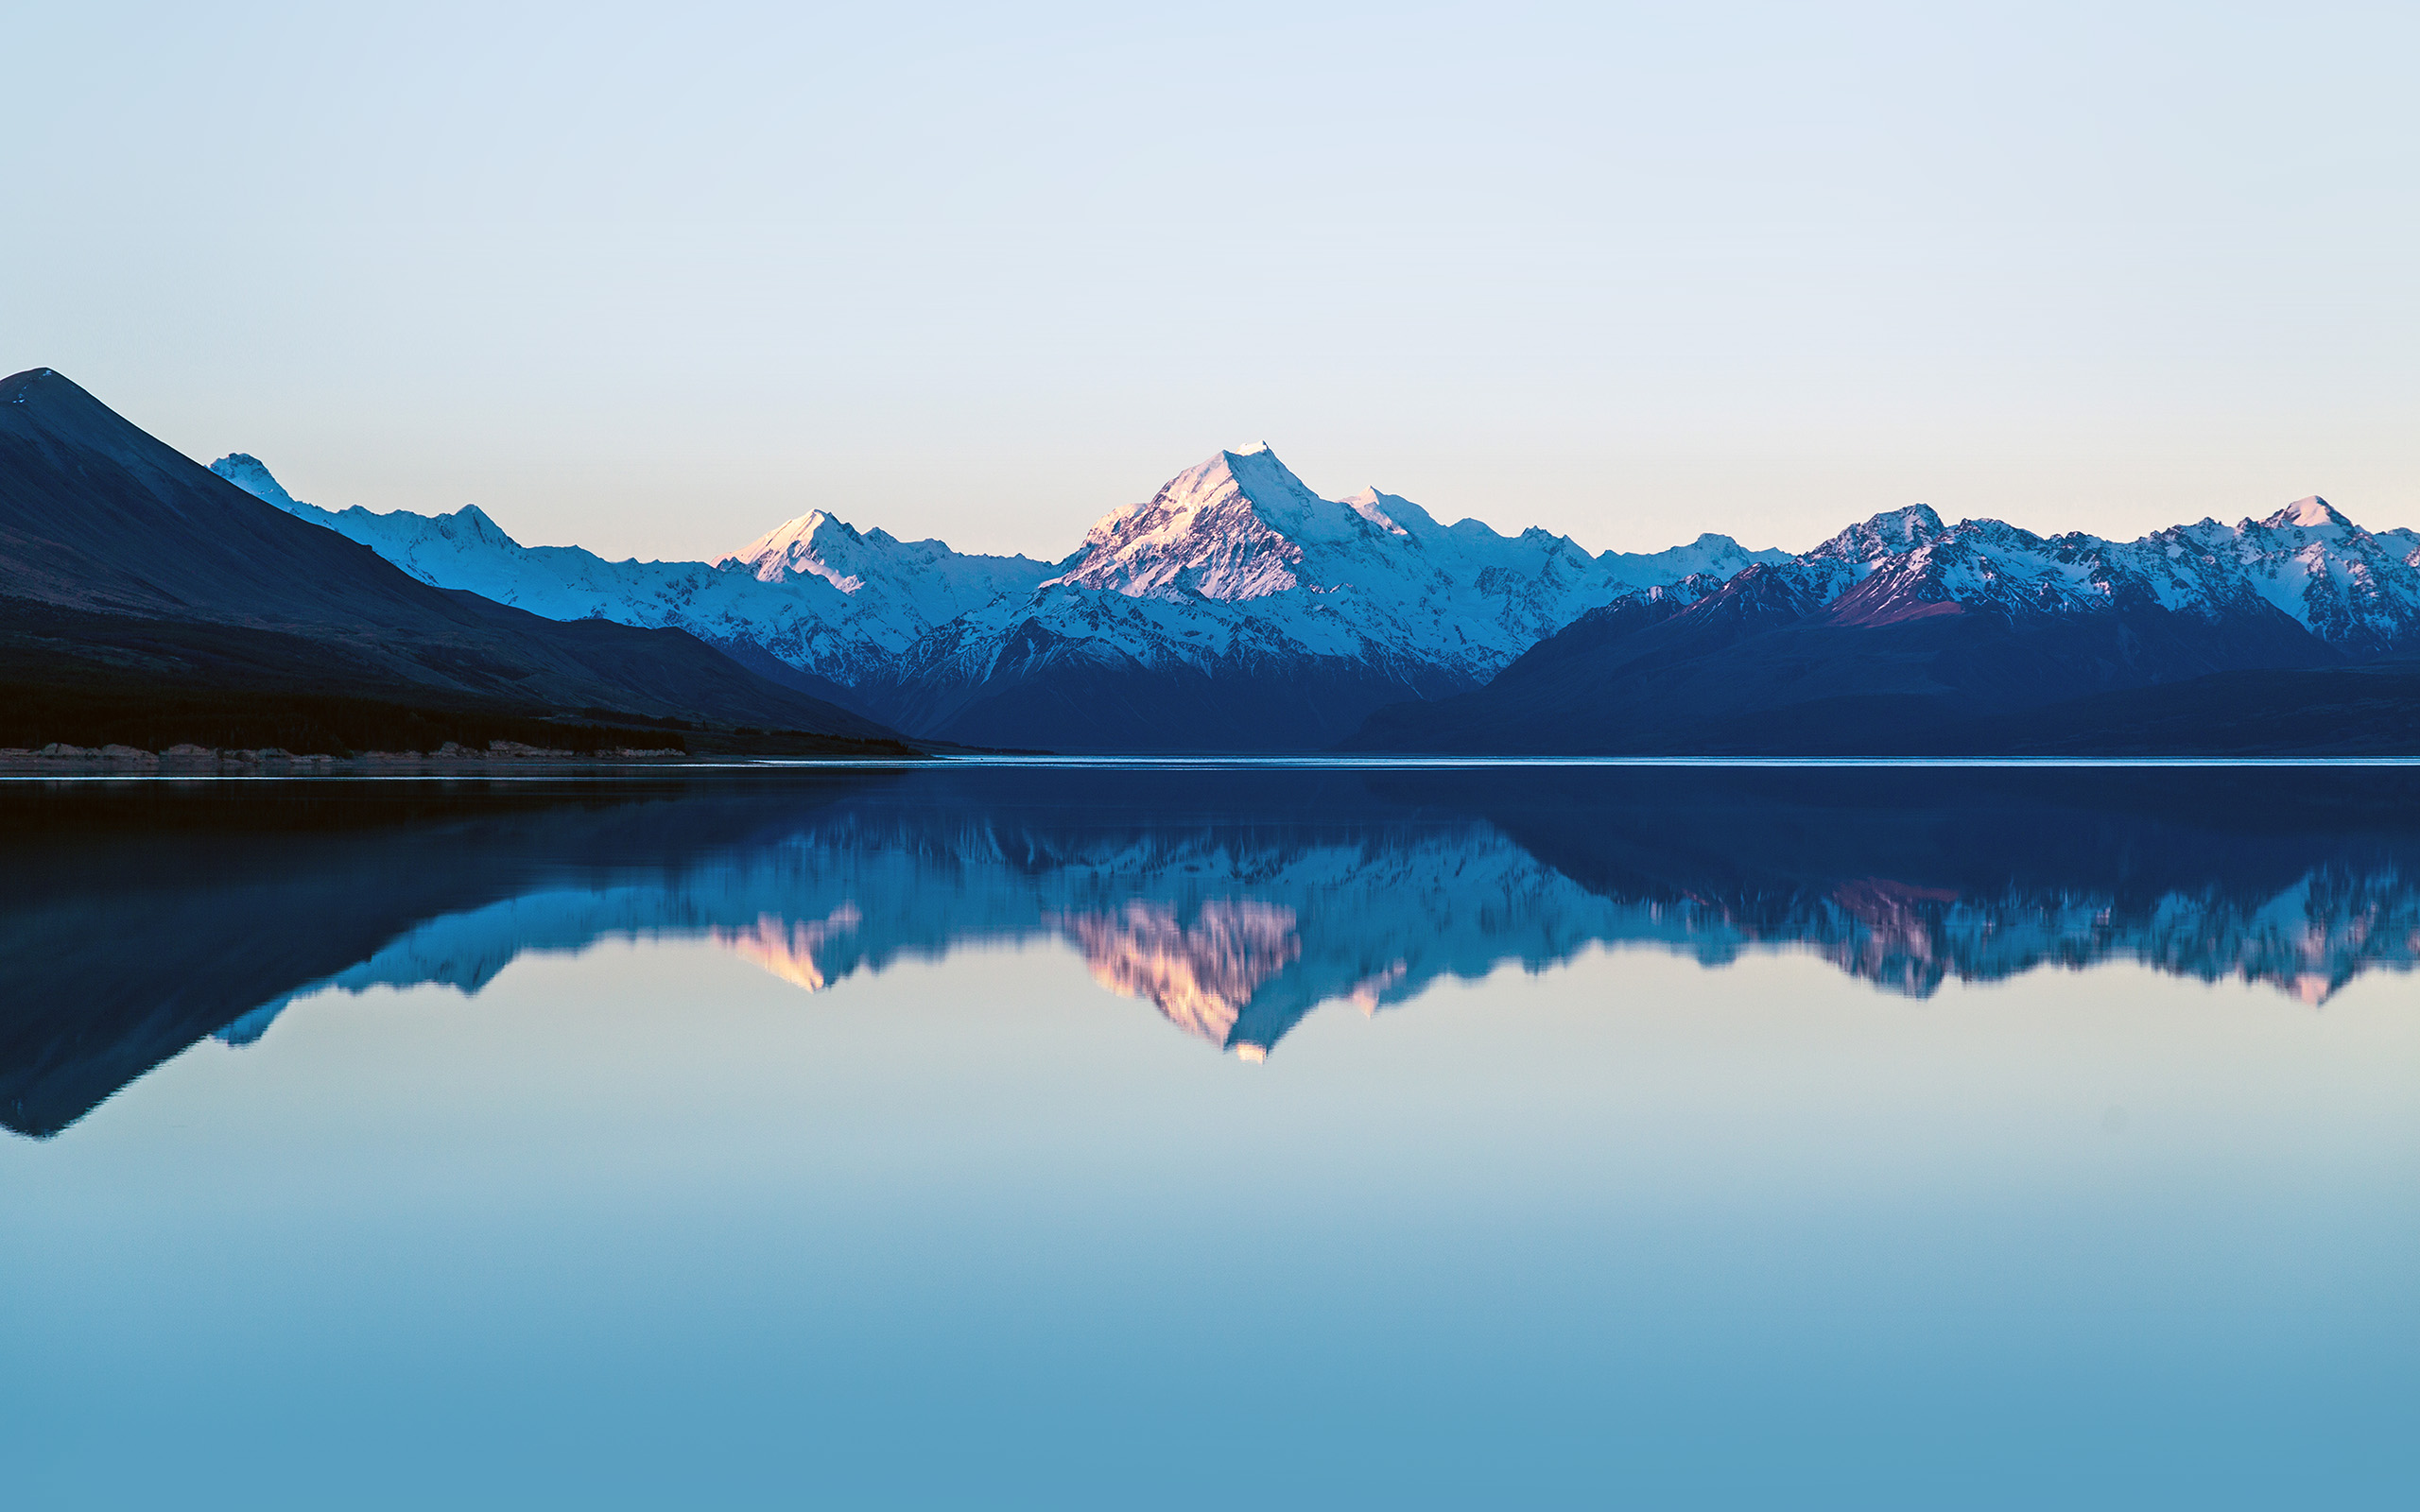 Minimalist Parallax Hd Iphone Ipad Wallpaper: Mz73-mountain-lake-beautiful-nature-blue-sky-wallpaper